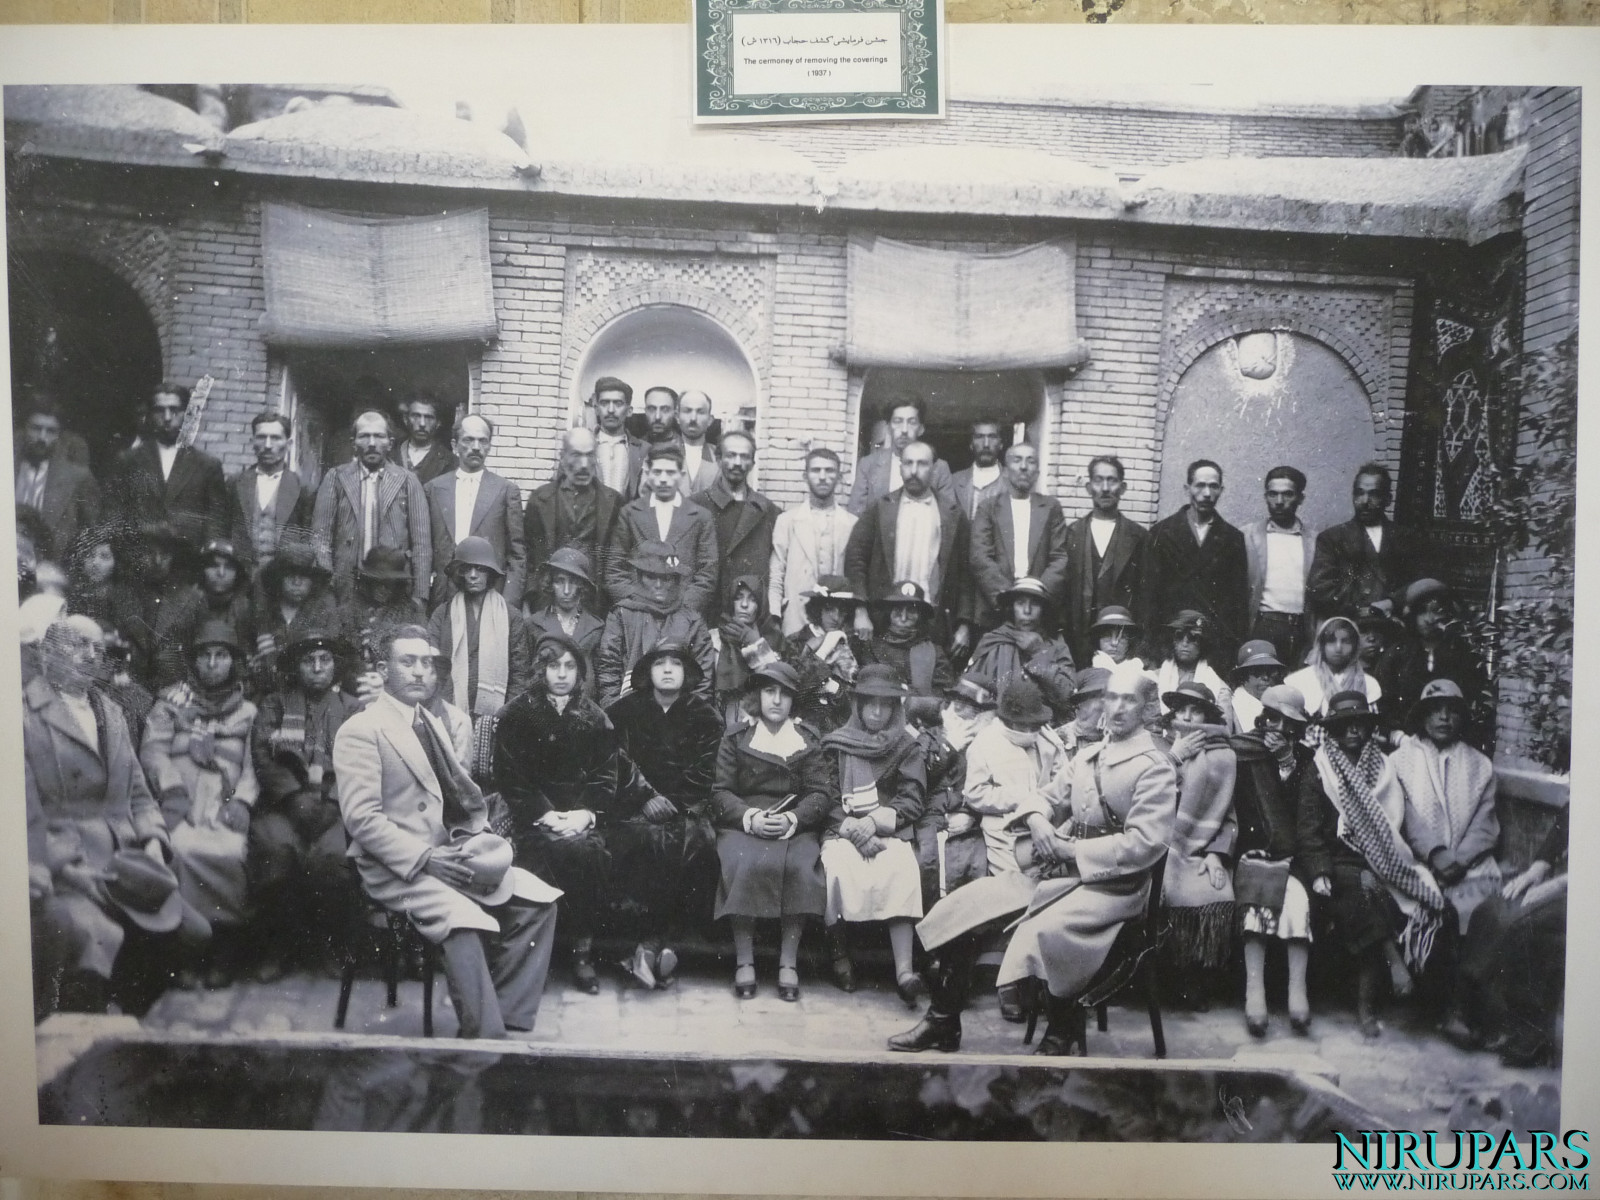 Arg-e Karim Khan - Covering Removal Ceremony